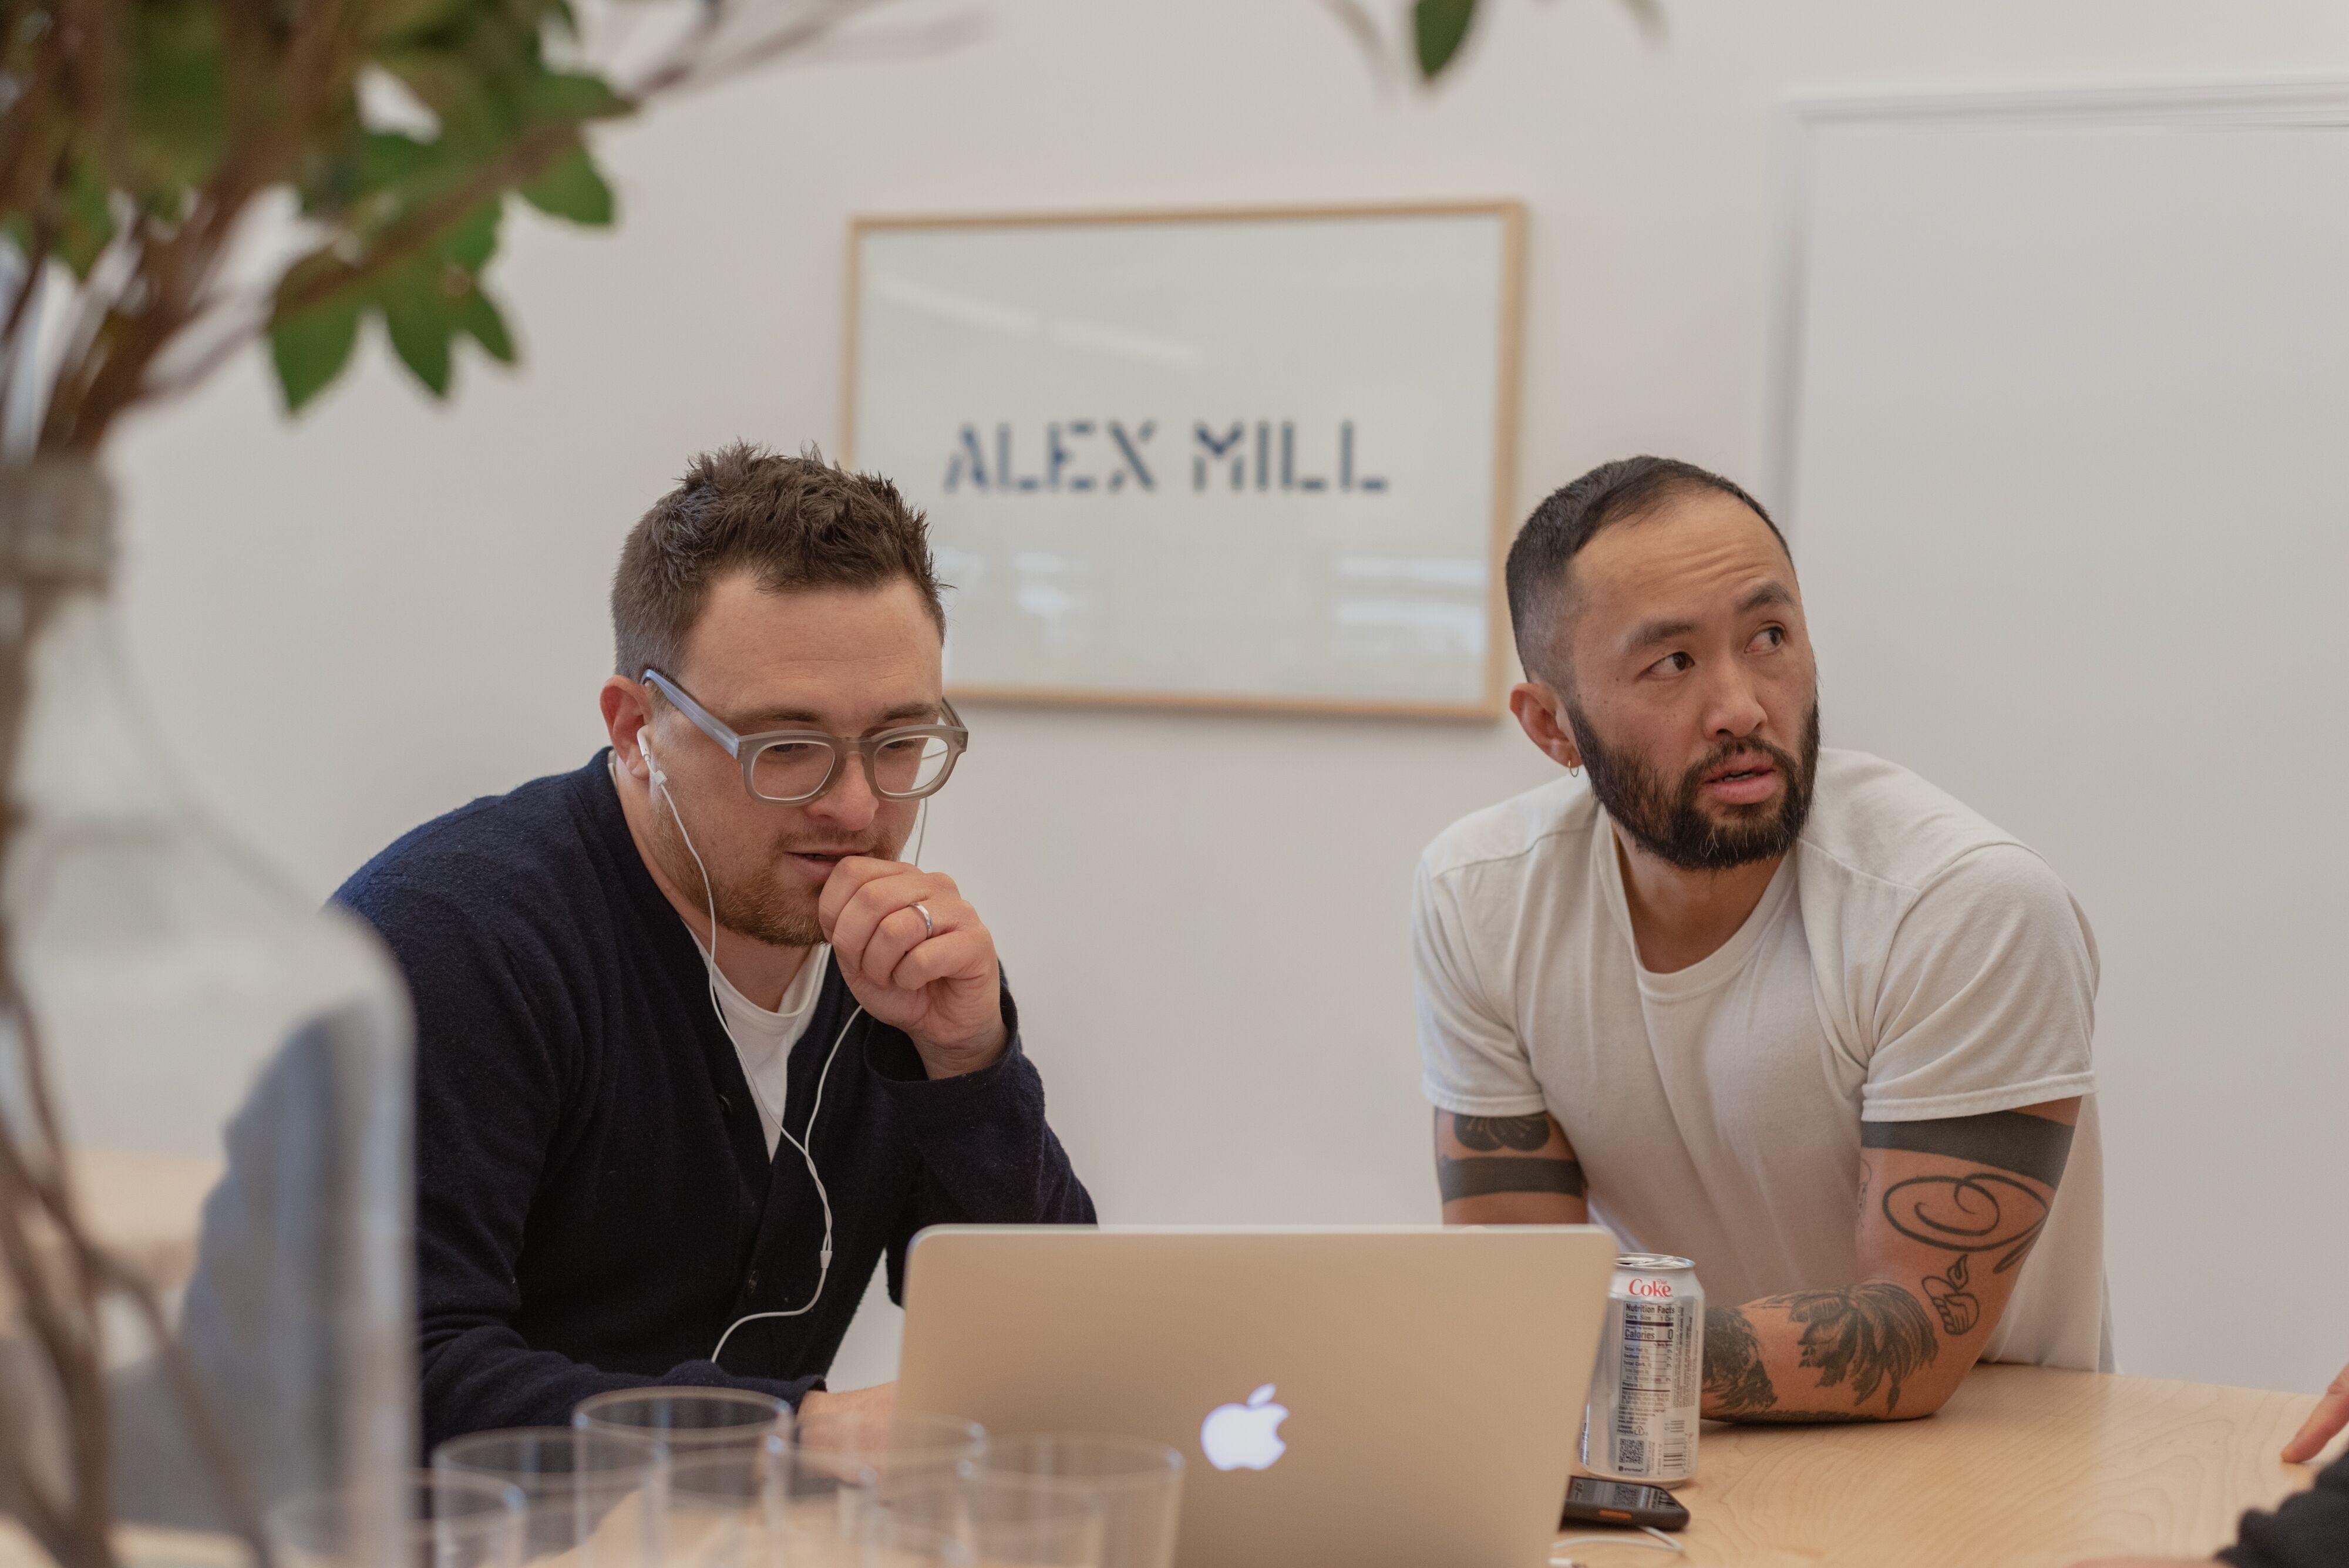 Alex Drexler and Somsack Sikhounmuong | Photo: Grant Legan, Courtesy of Alex Mill